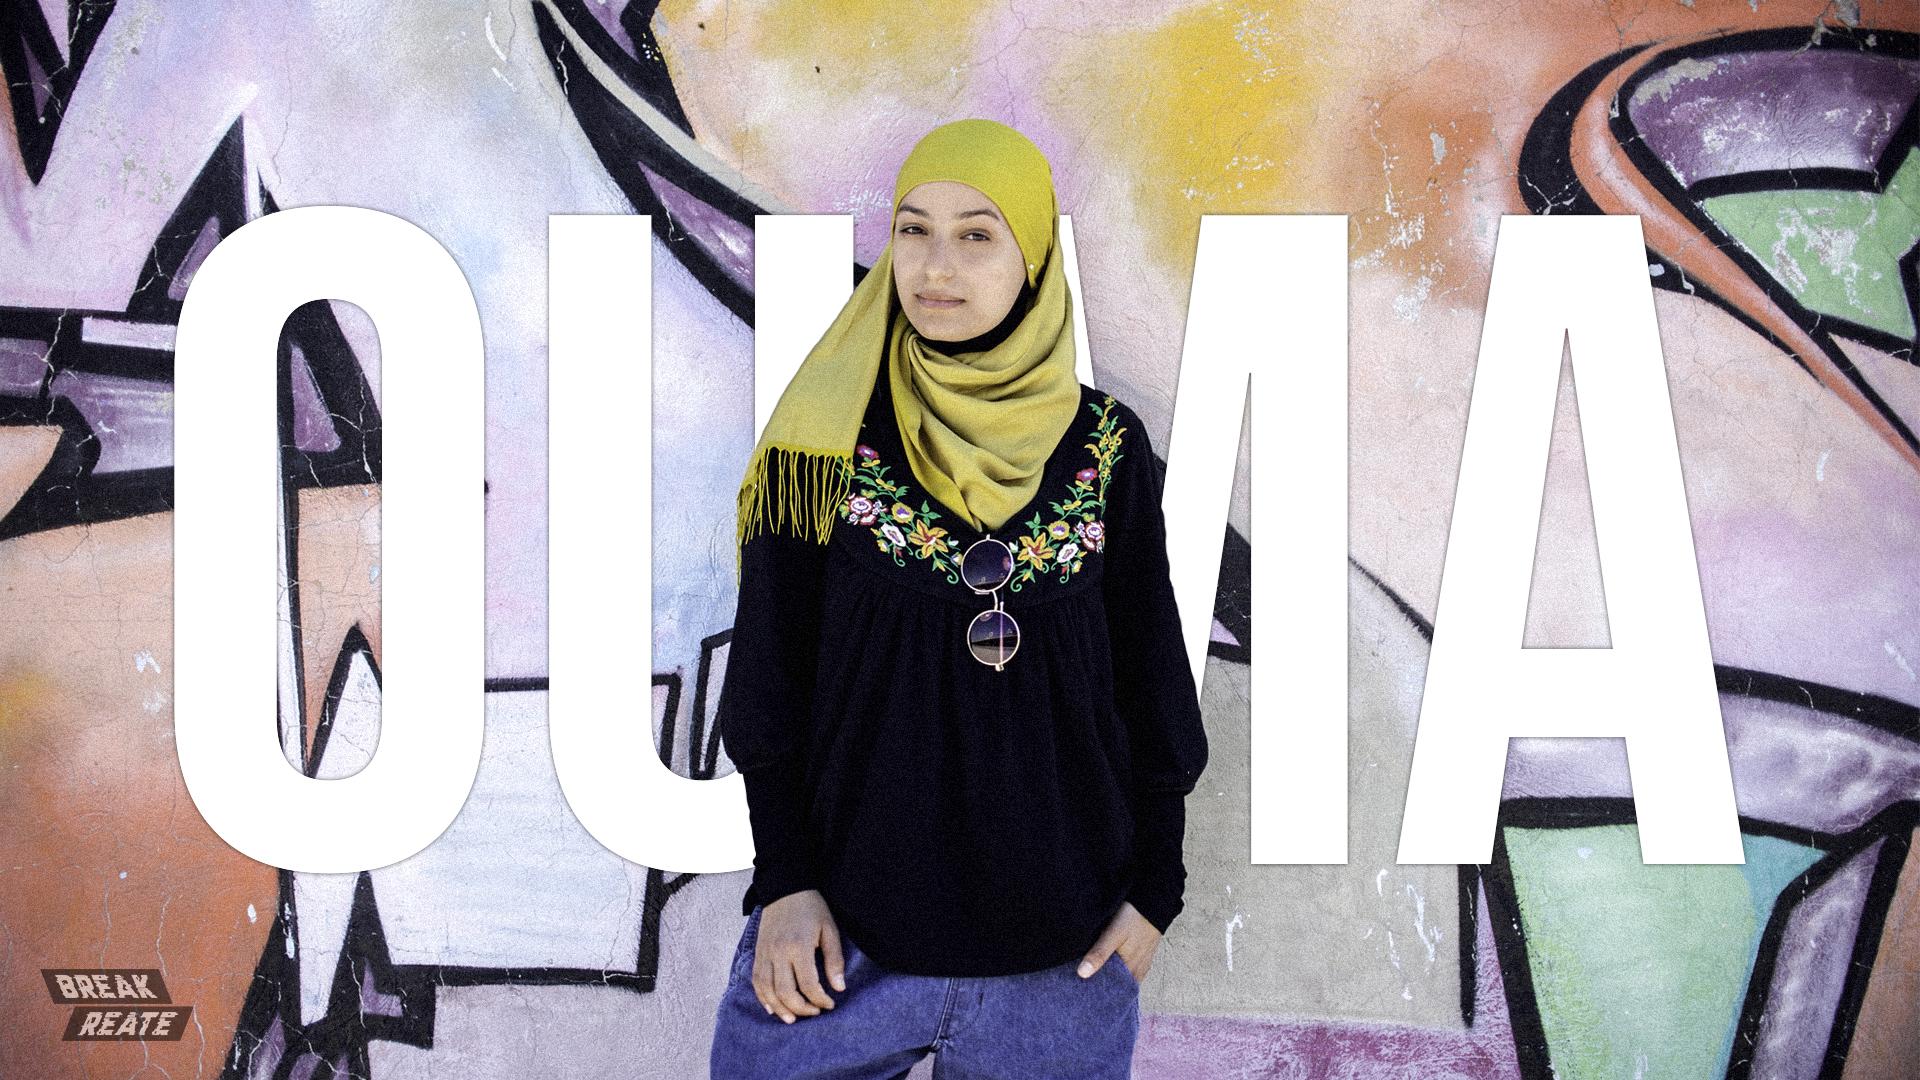 Oumema Bouassida aka Ouma: Changing Perceptions Through Street Art